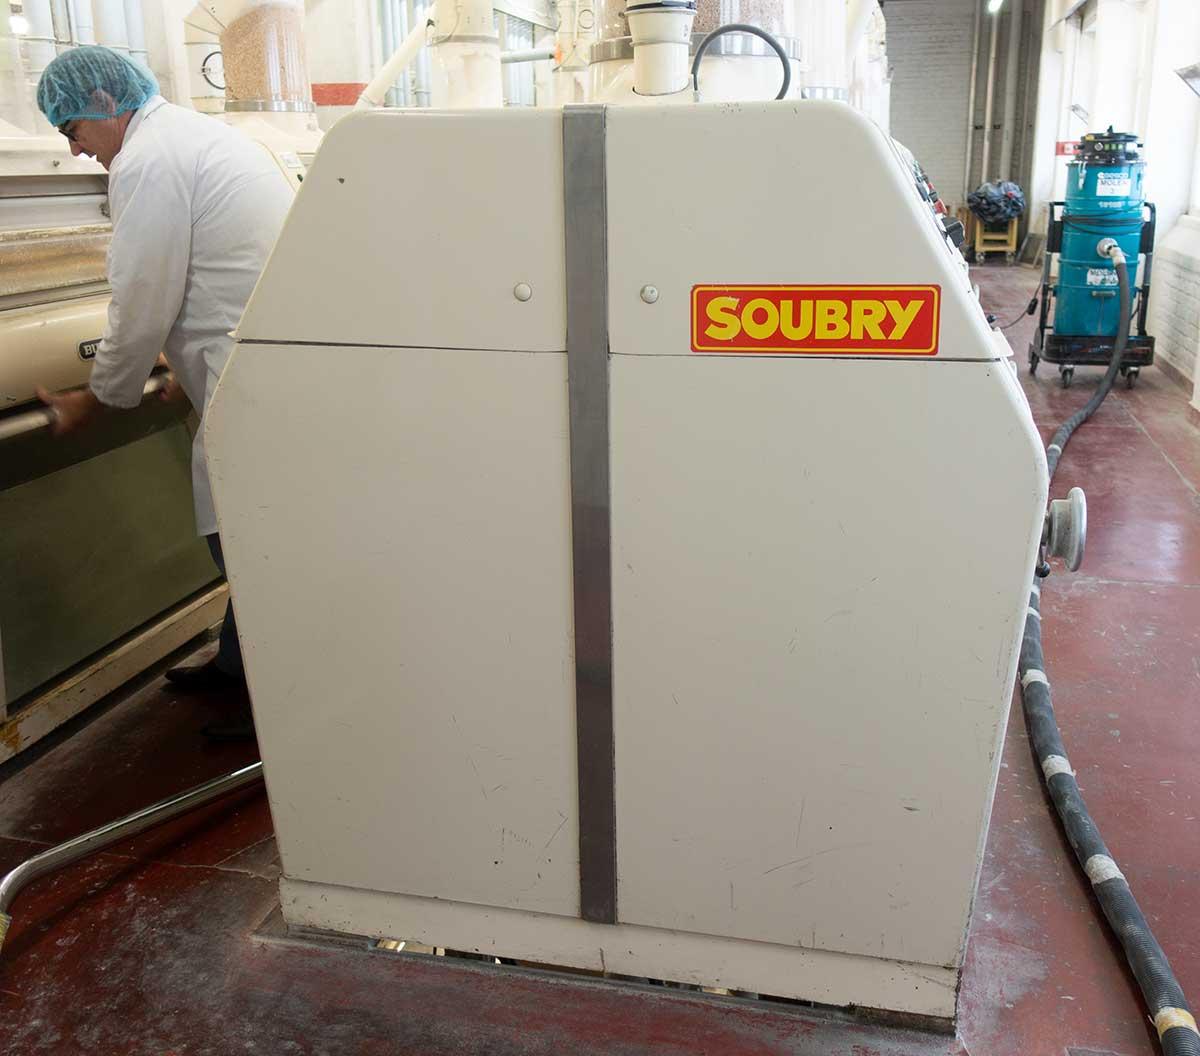 Soubry fabriek